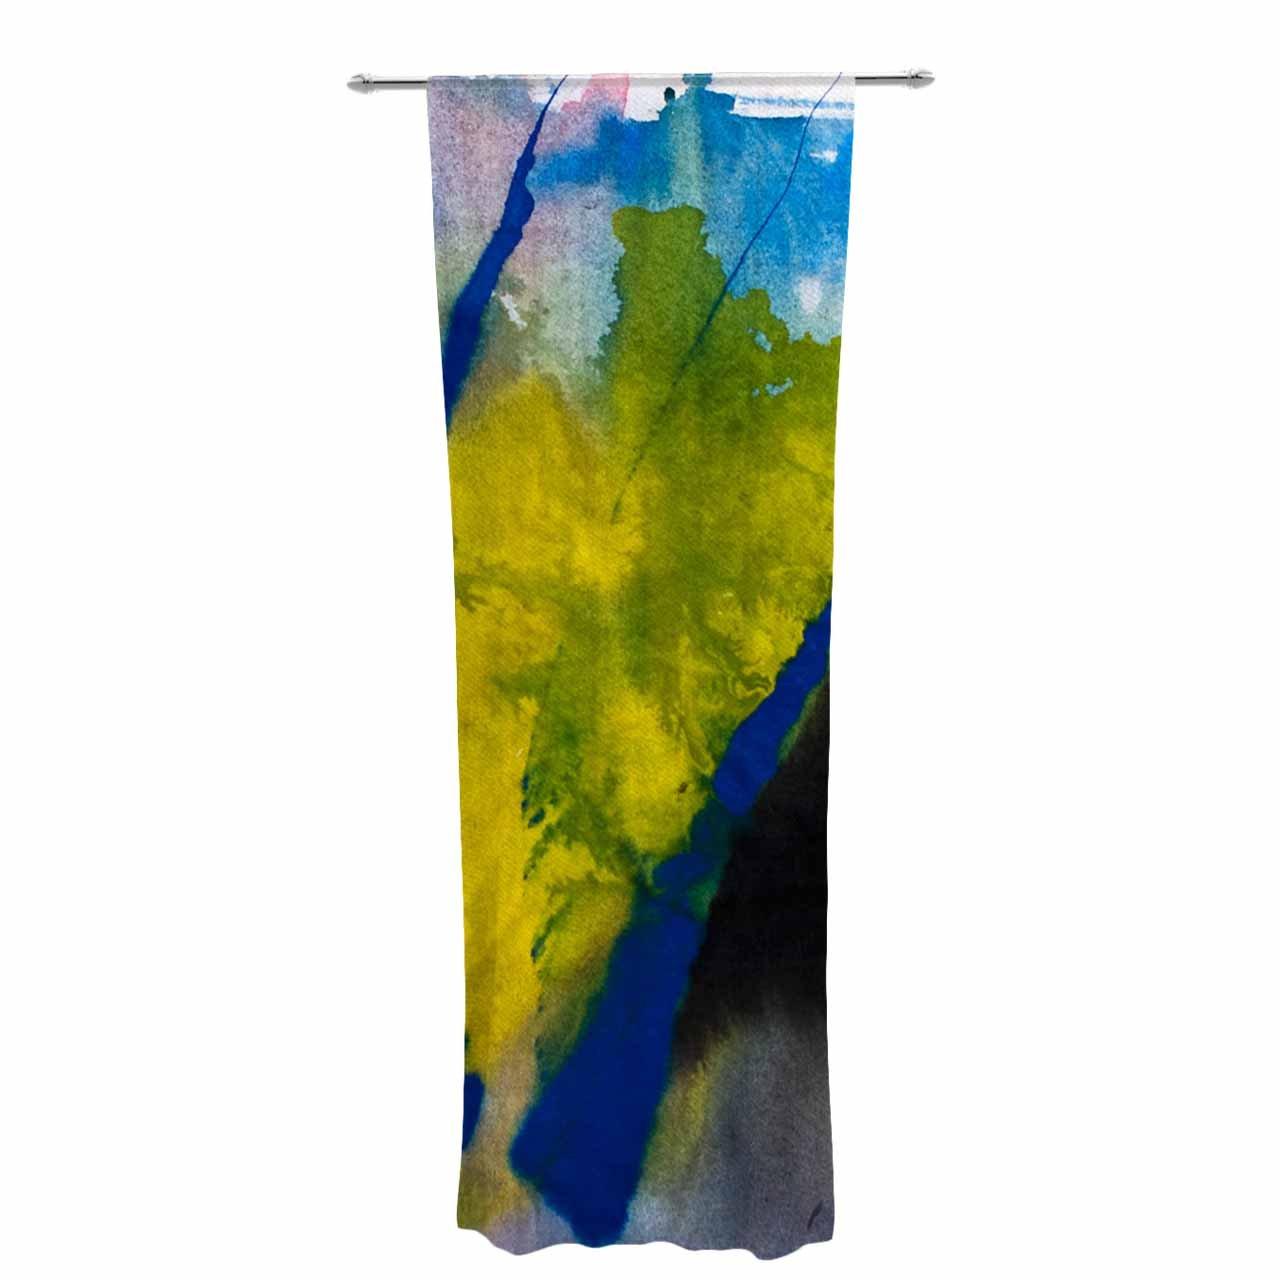 30 x 84 Sheer Curtains Kess InHouse Malia Shields Exploration Yellow Blue Decorative Set